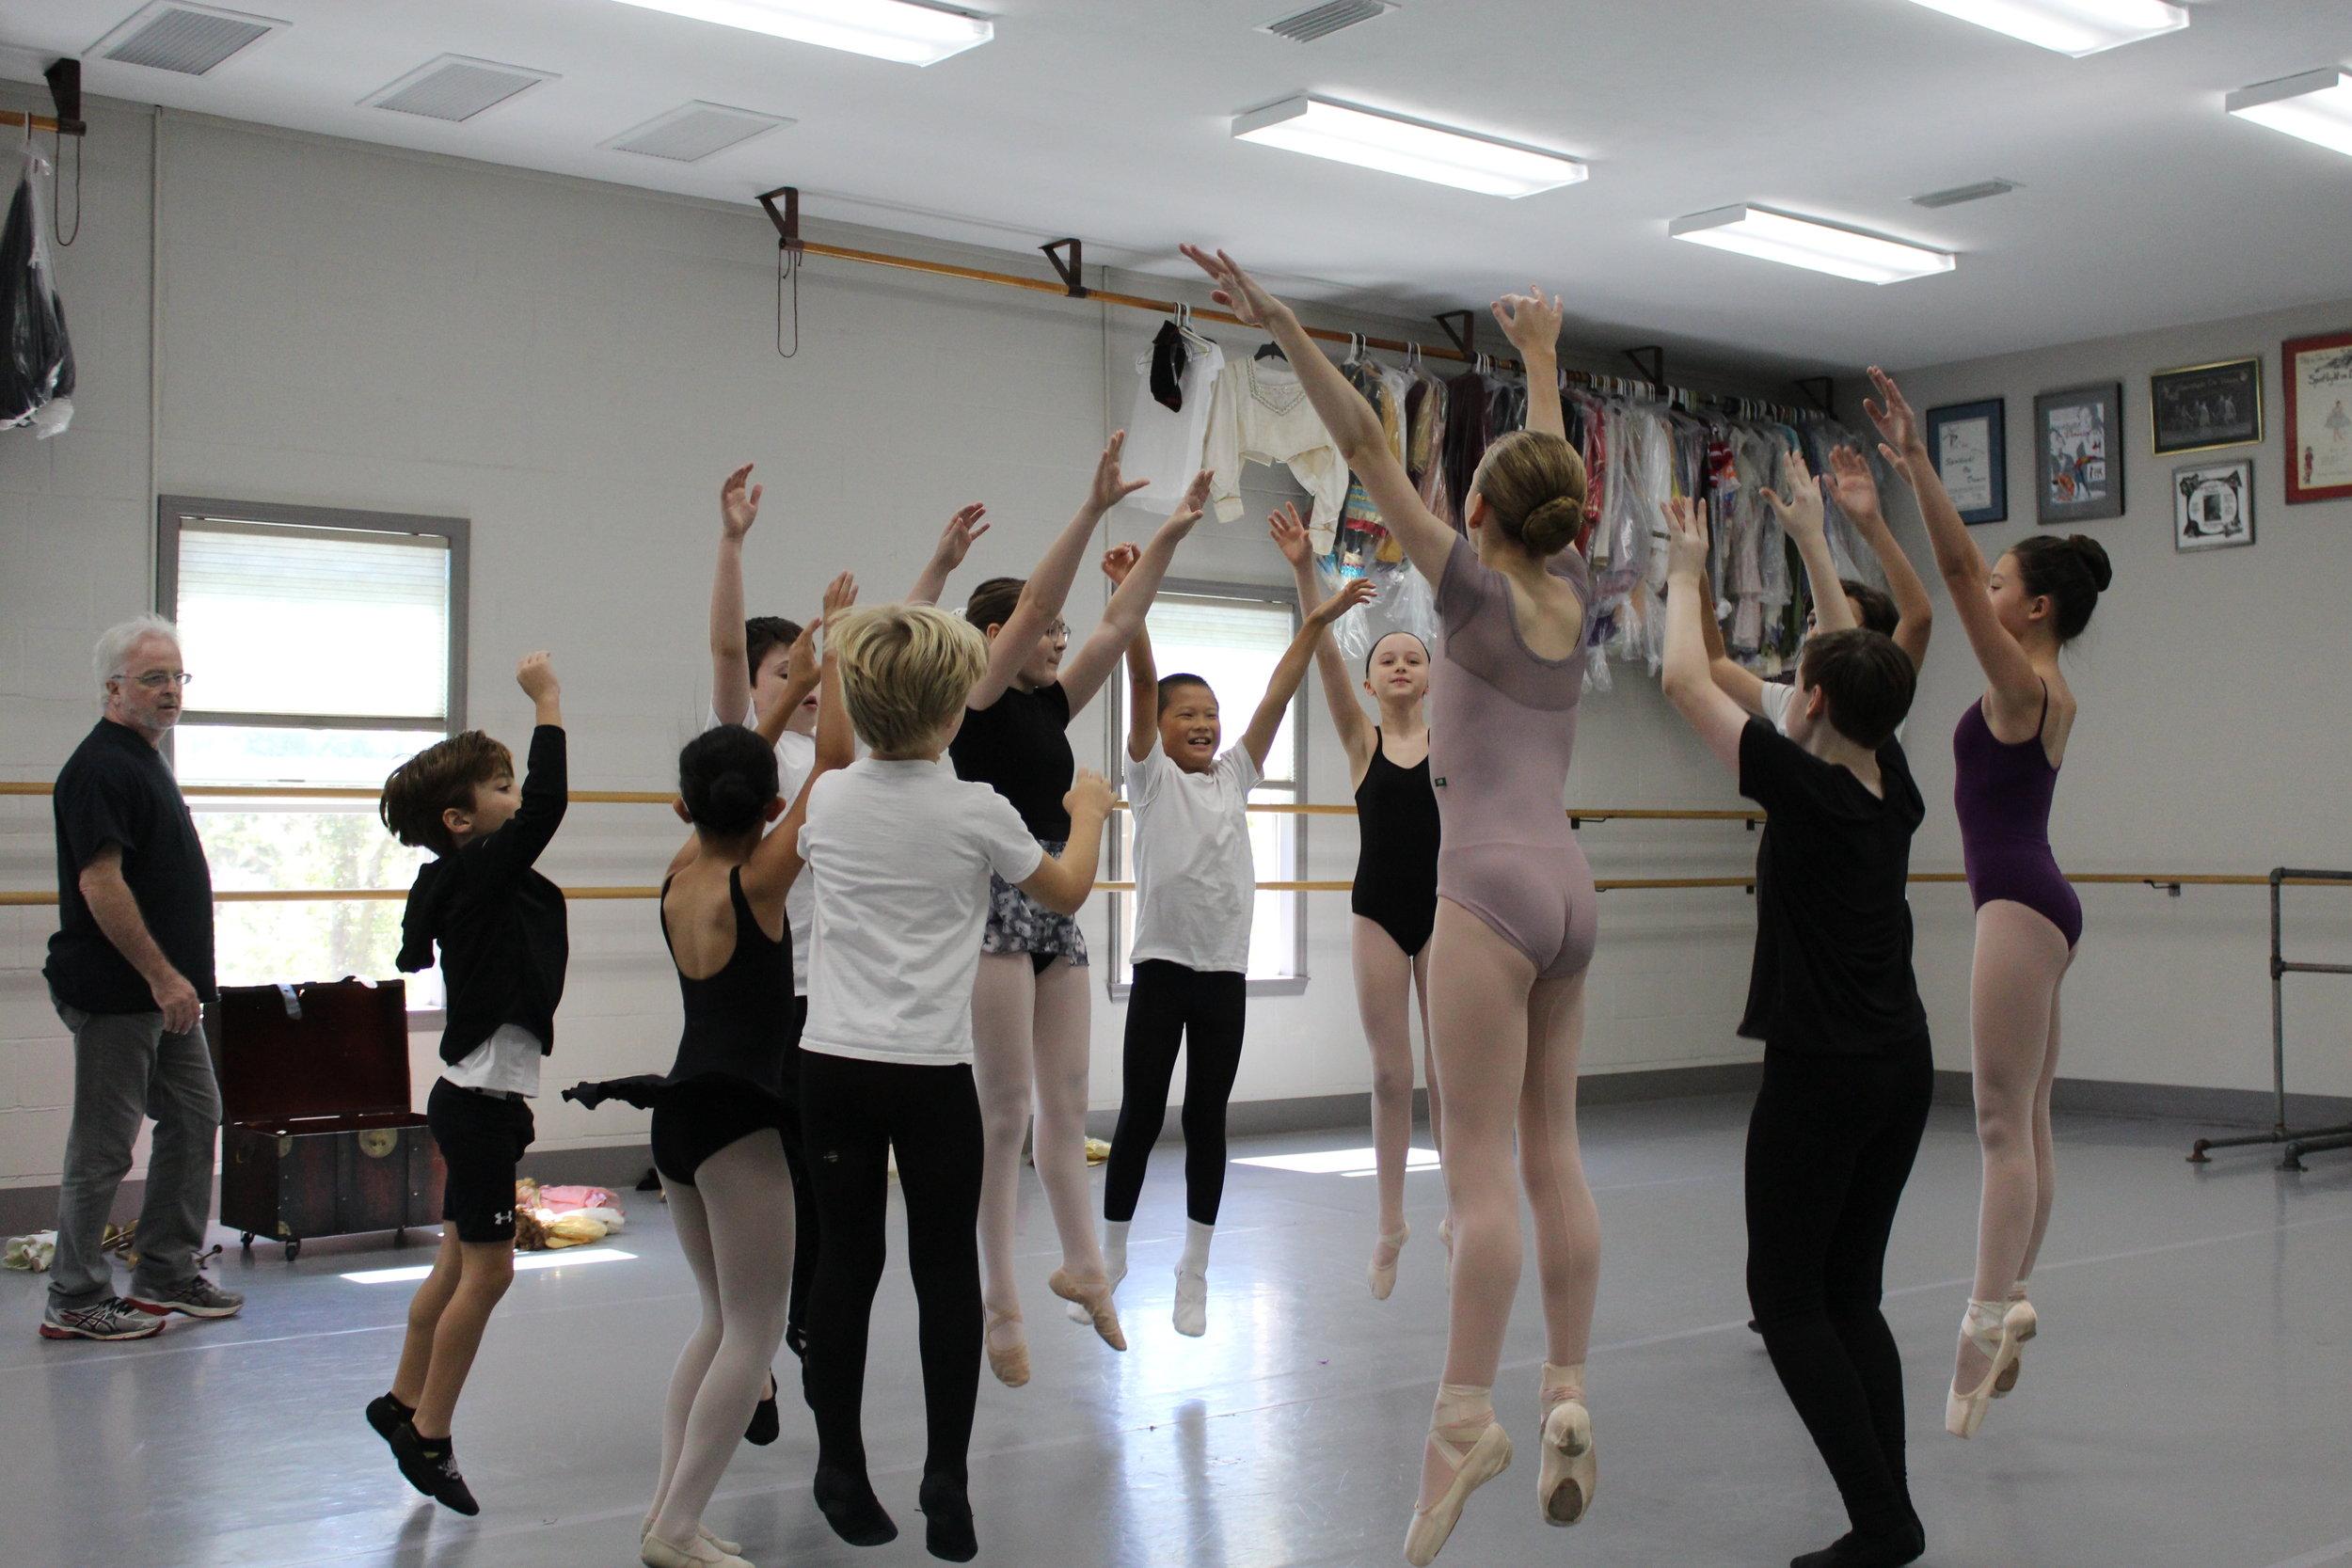 Junior Ballet Technique 6-7 pm $45/week - For dancers in the Scholar and Ballet 2 Levels